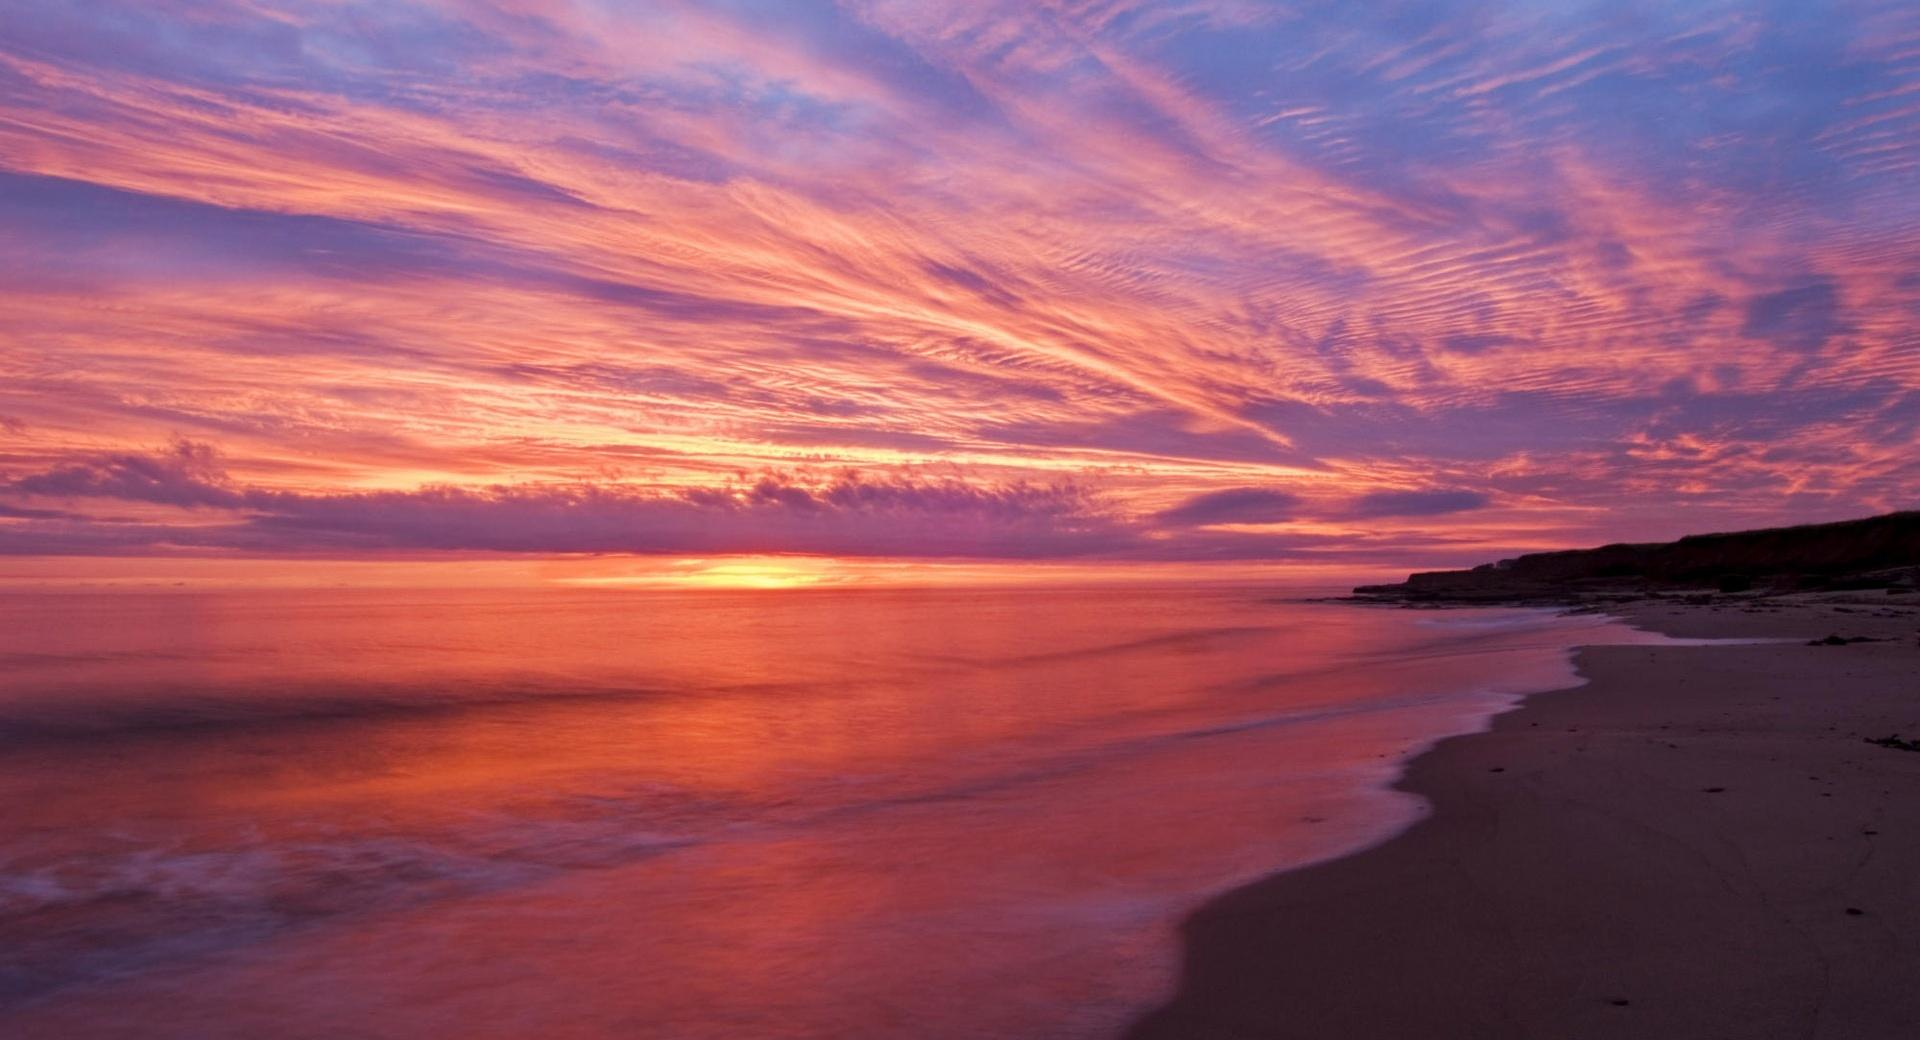 Sunrise Beach wallpapers HD quality